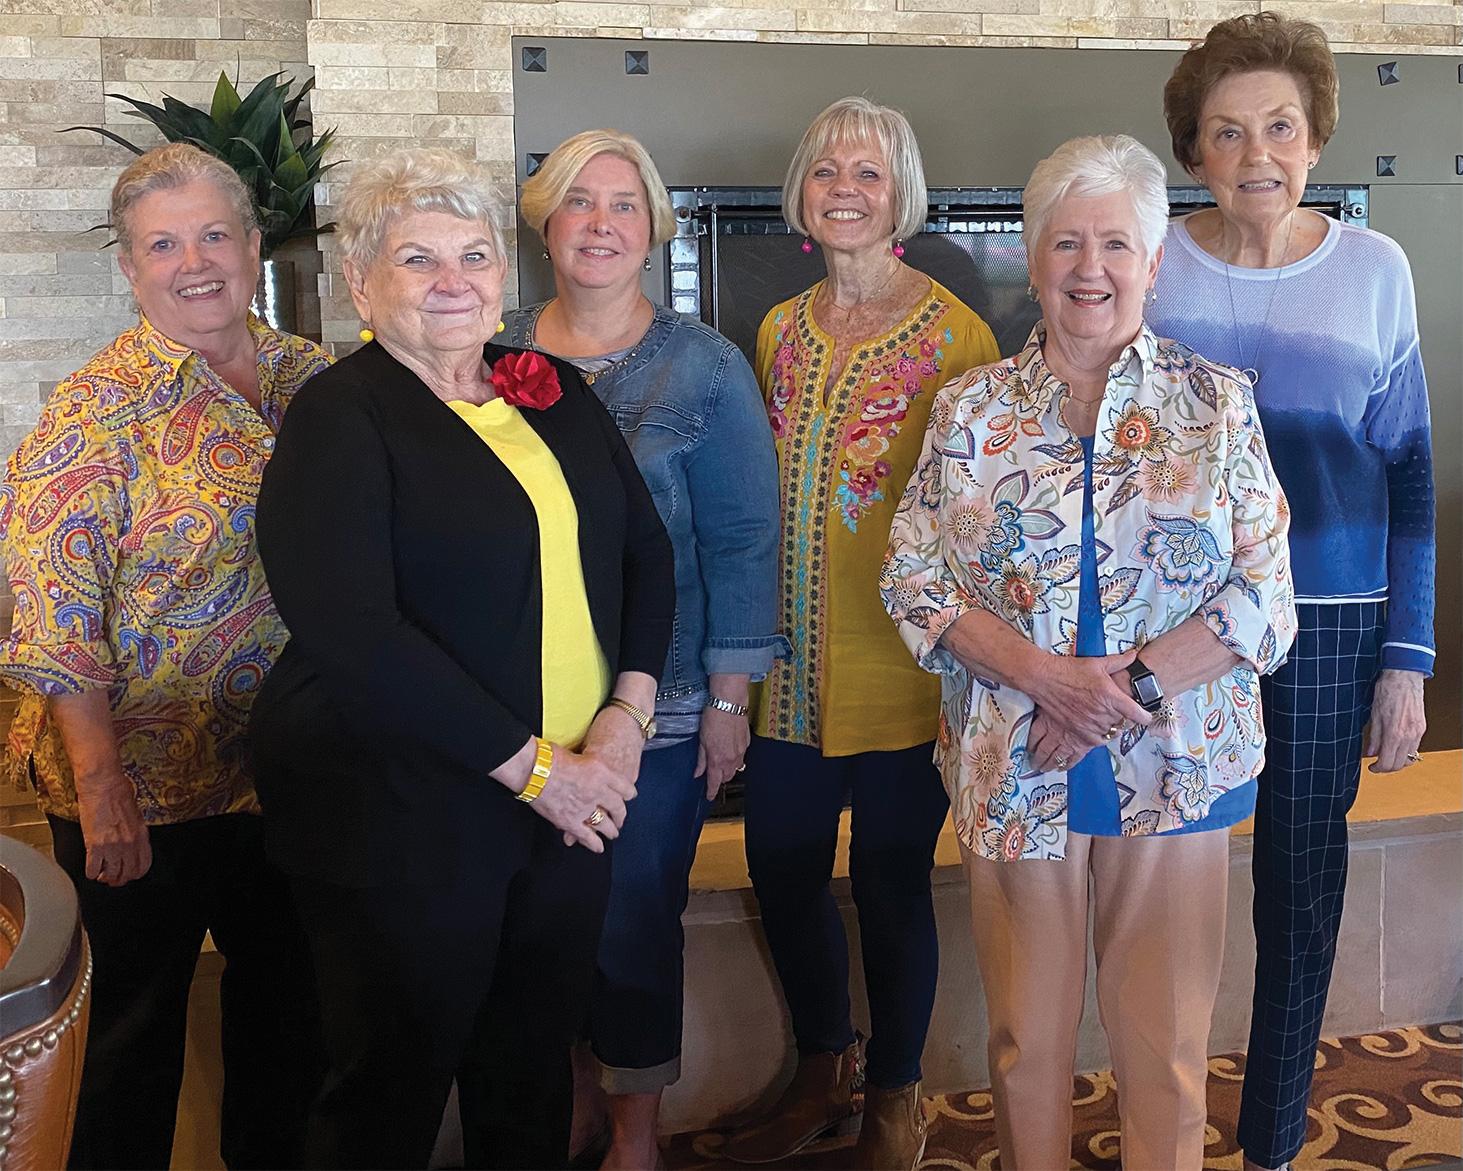 Left to right: Linda Lekawski (Oklahoma State), Jan Utzman (Oklahoma State), Sue Davis (SMU), Consie Javor (Sam Houston State), Kay Schorn (Colorado State), and Martha Fagin (University of Oklahoma); not pictured: Kathryn Stream (Vanderbilt) and Elaine Sabre (New Mexico State)